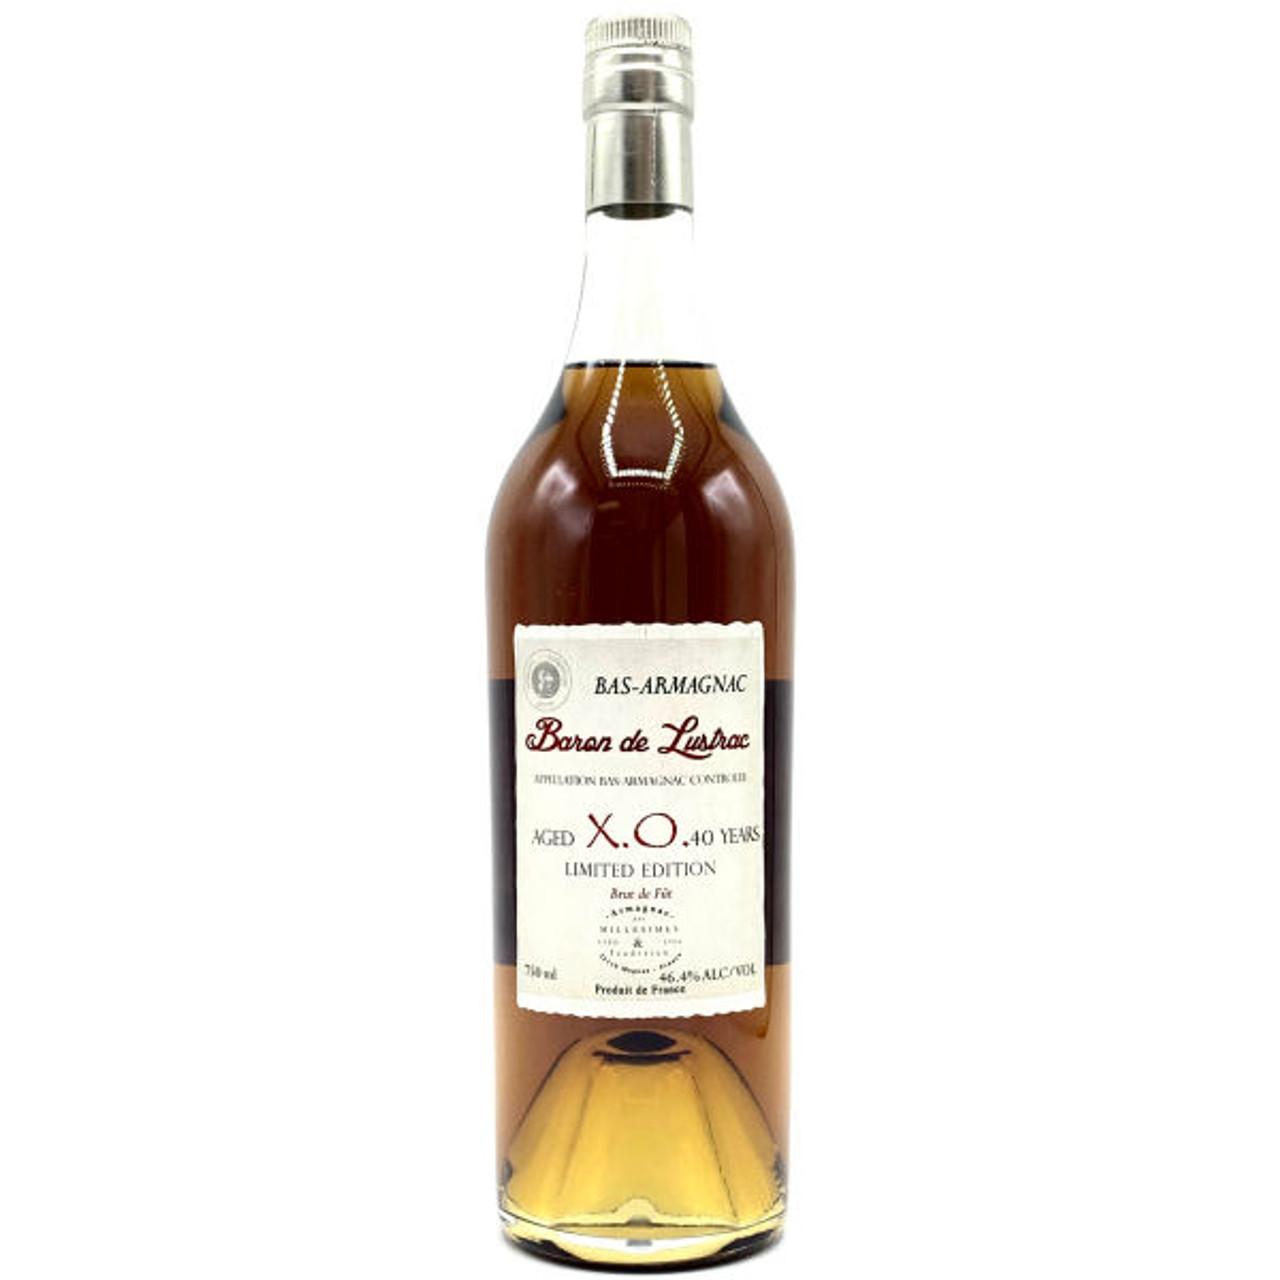 Baron de Lustrac 40 Year Old XO Bas Armagnac 750ml